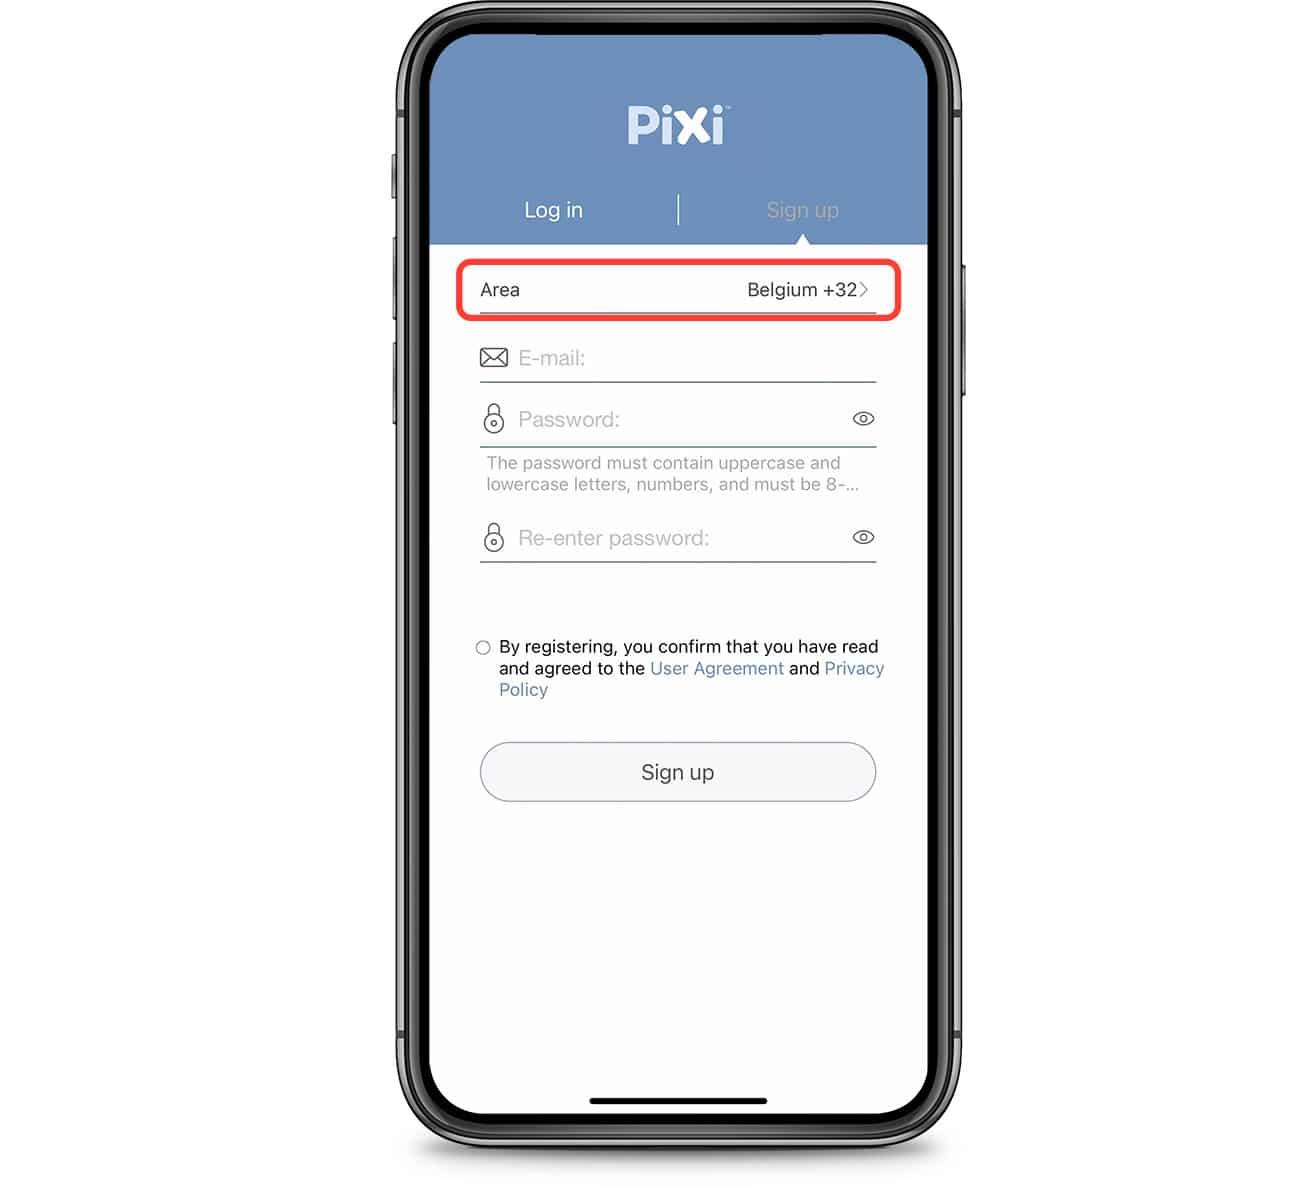 PIXI App correct area